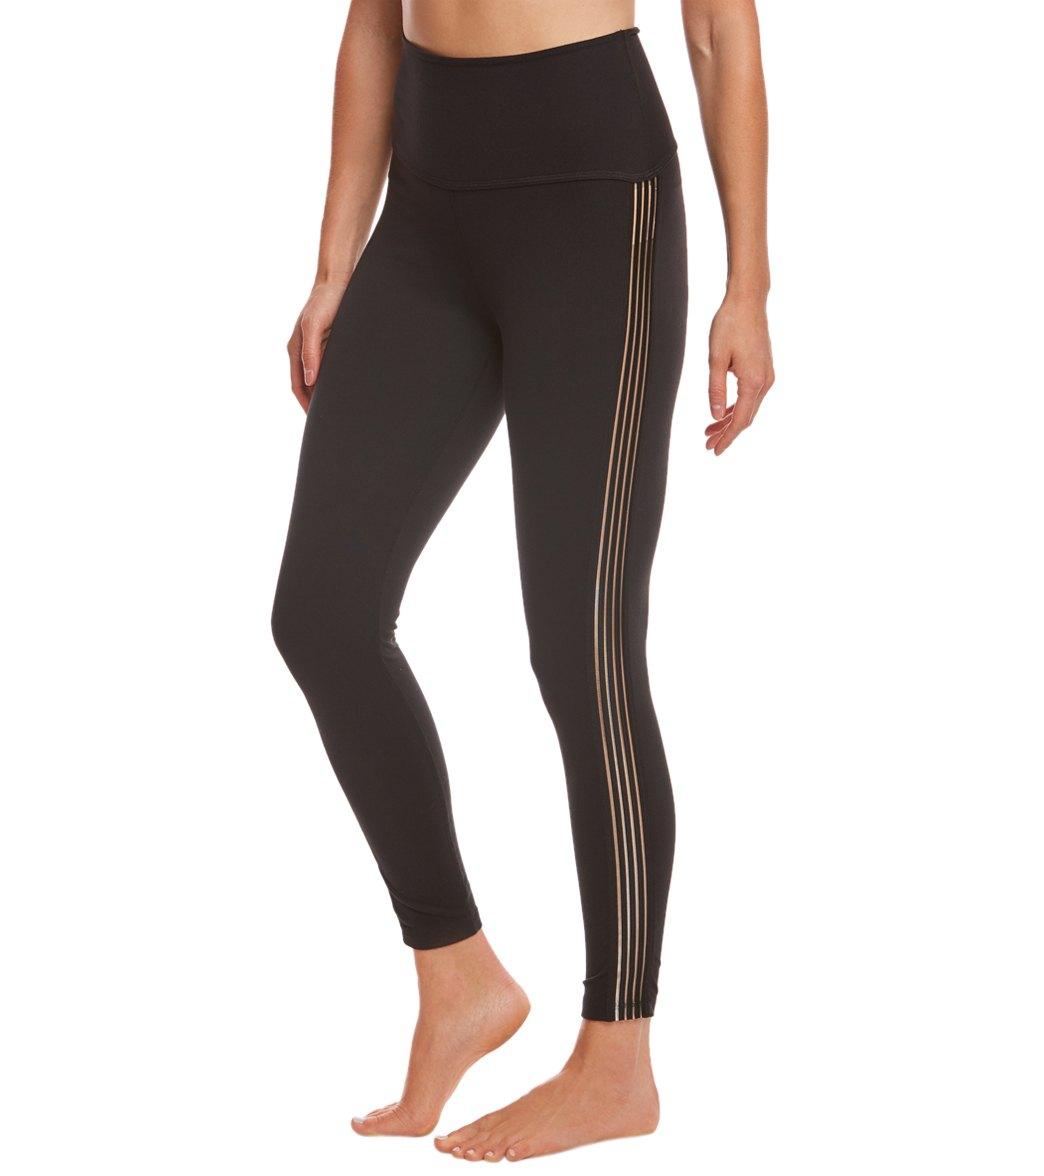 dfdebbe82e Beyond Yoga Sheer Illusion High Waisted 7 8 Yoga Leggings at ...